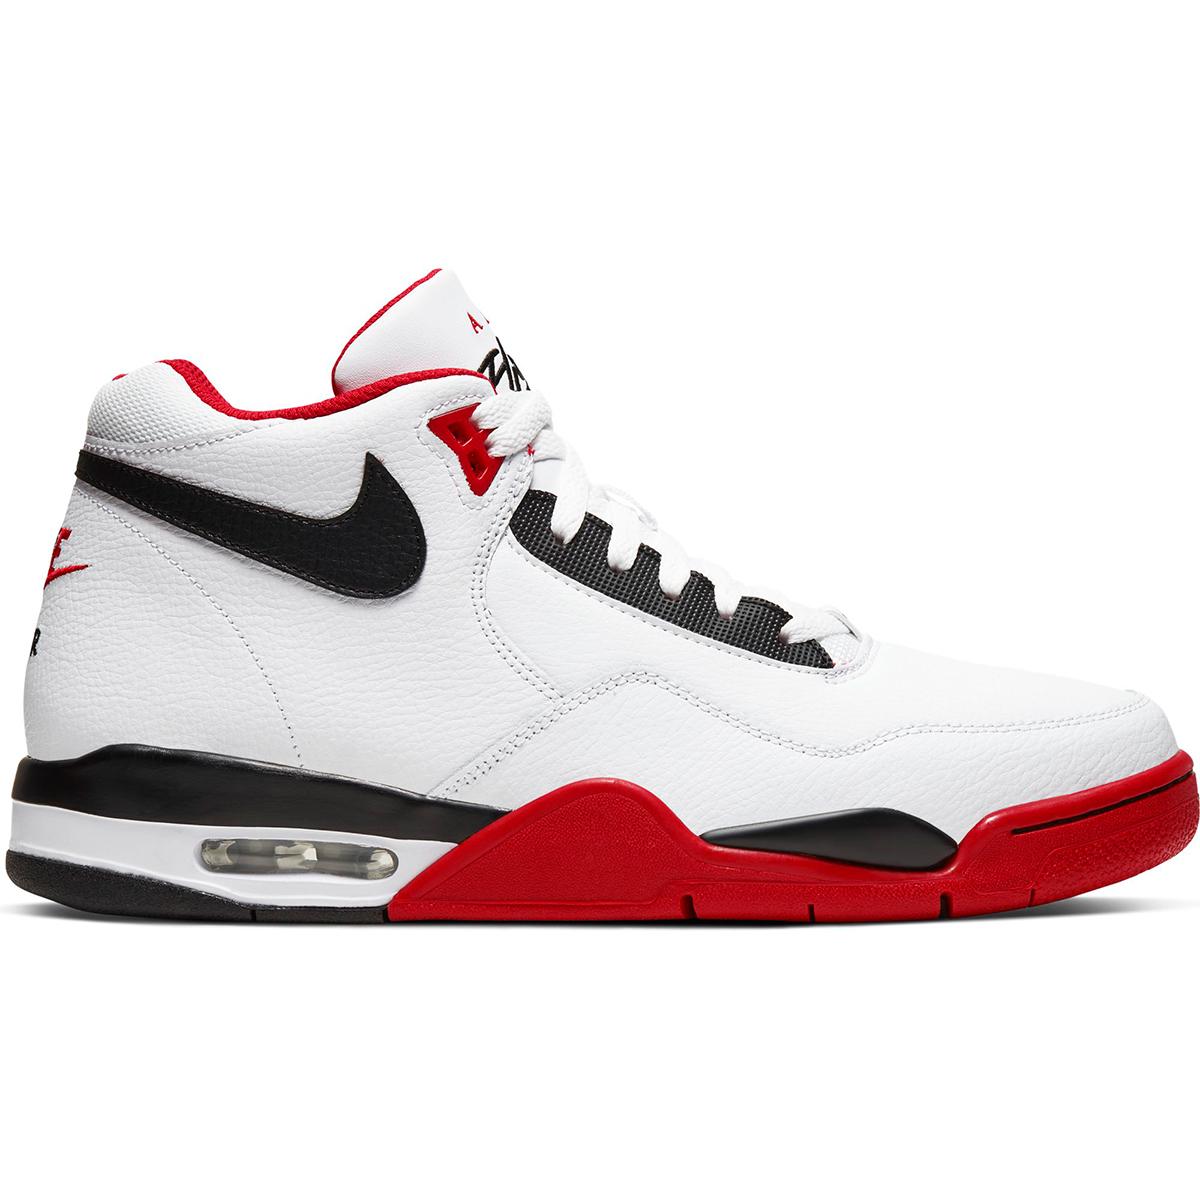 Nike Men's Flight Legacy Basketball Shoes - White, 8.5